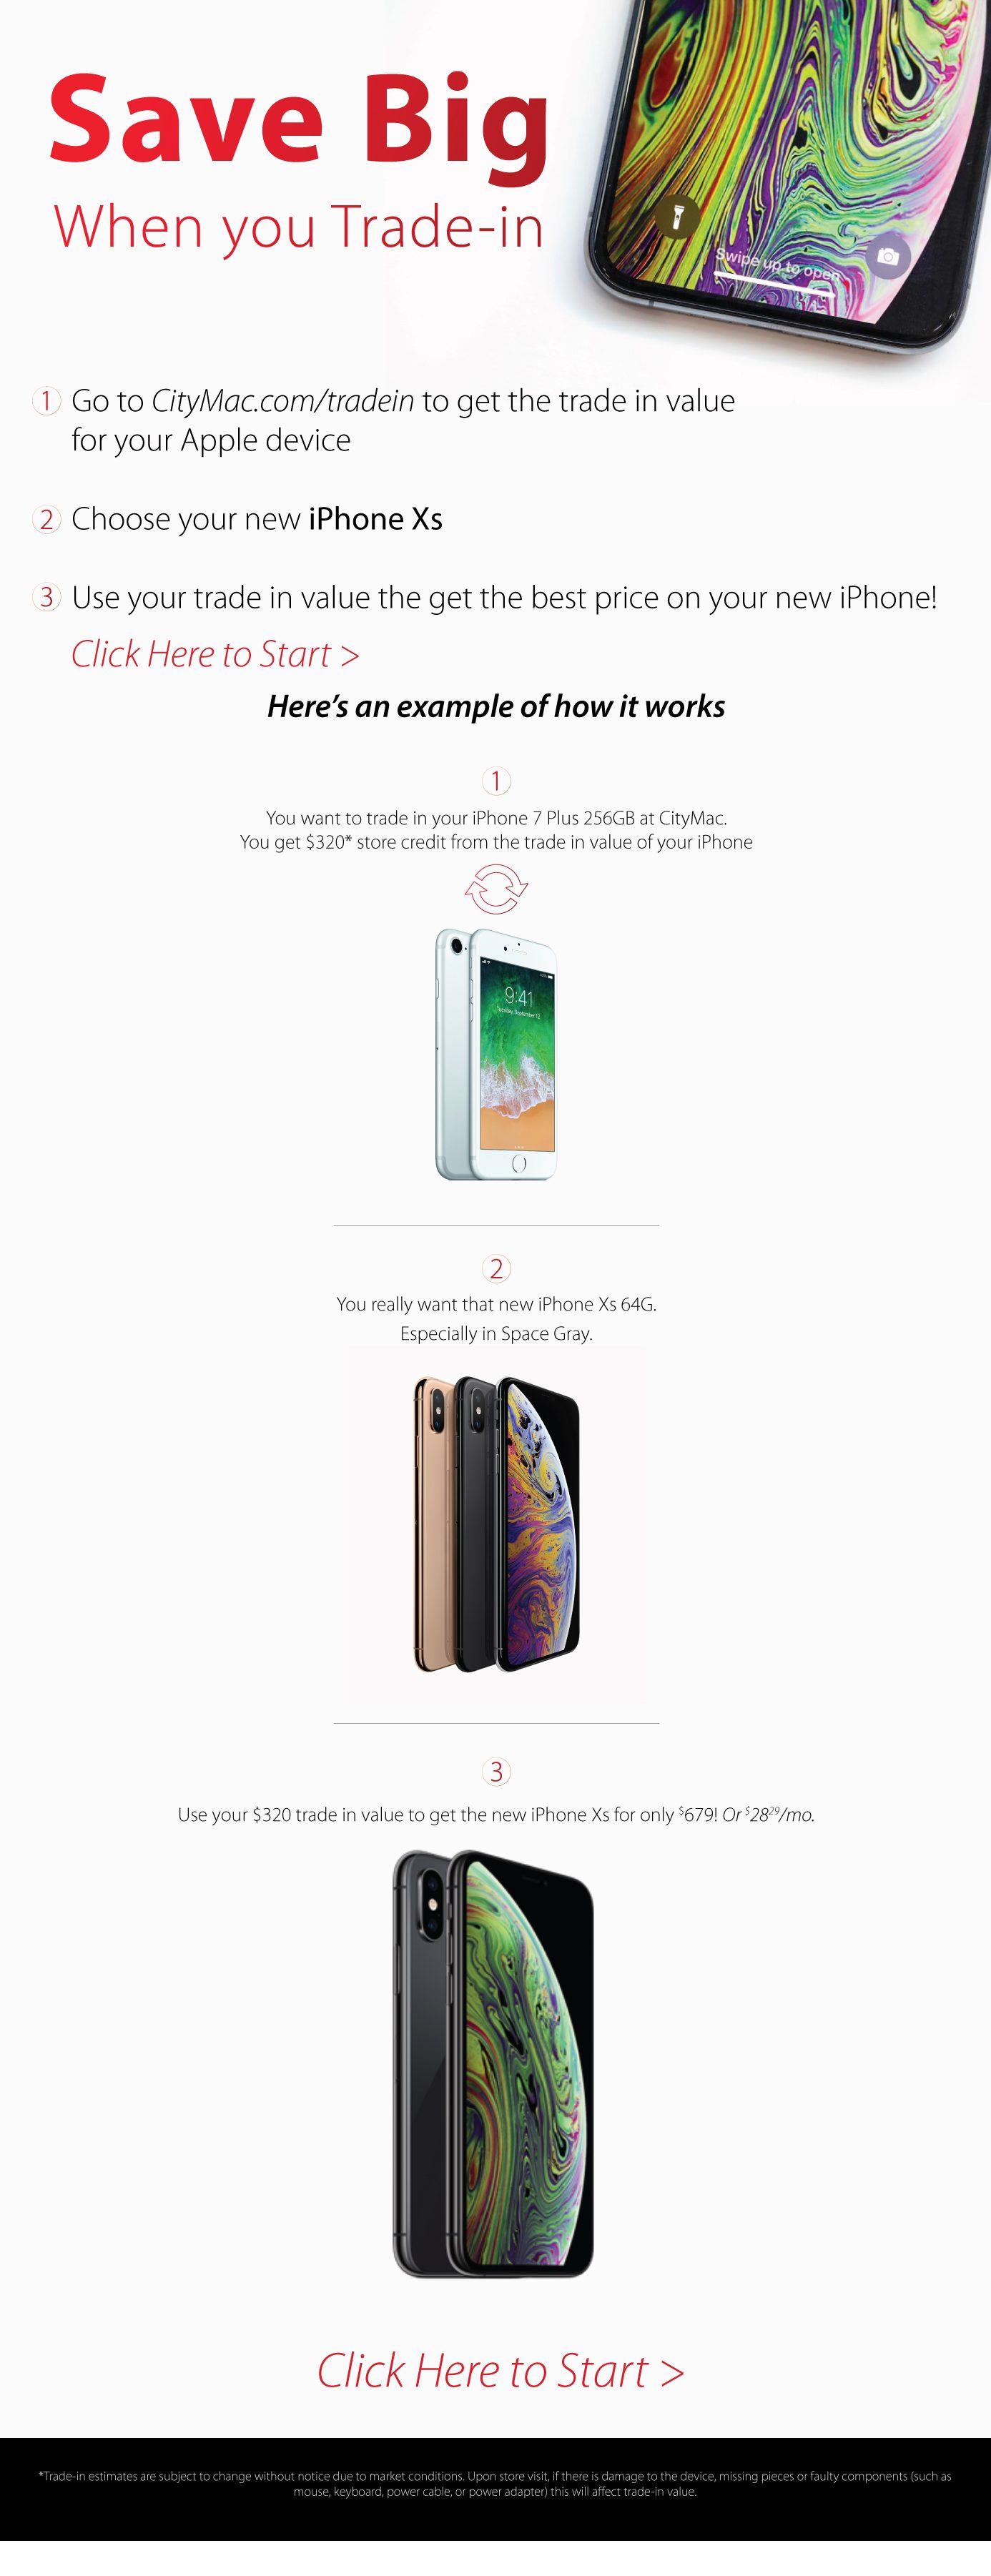 Save Big on New iPhone with citymac.com/tradein